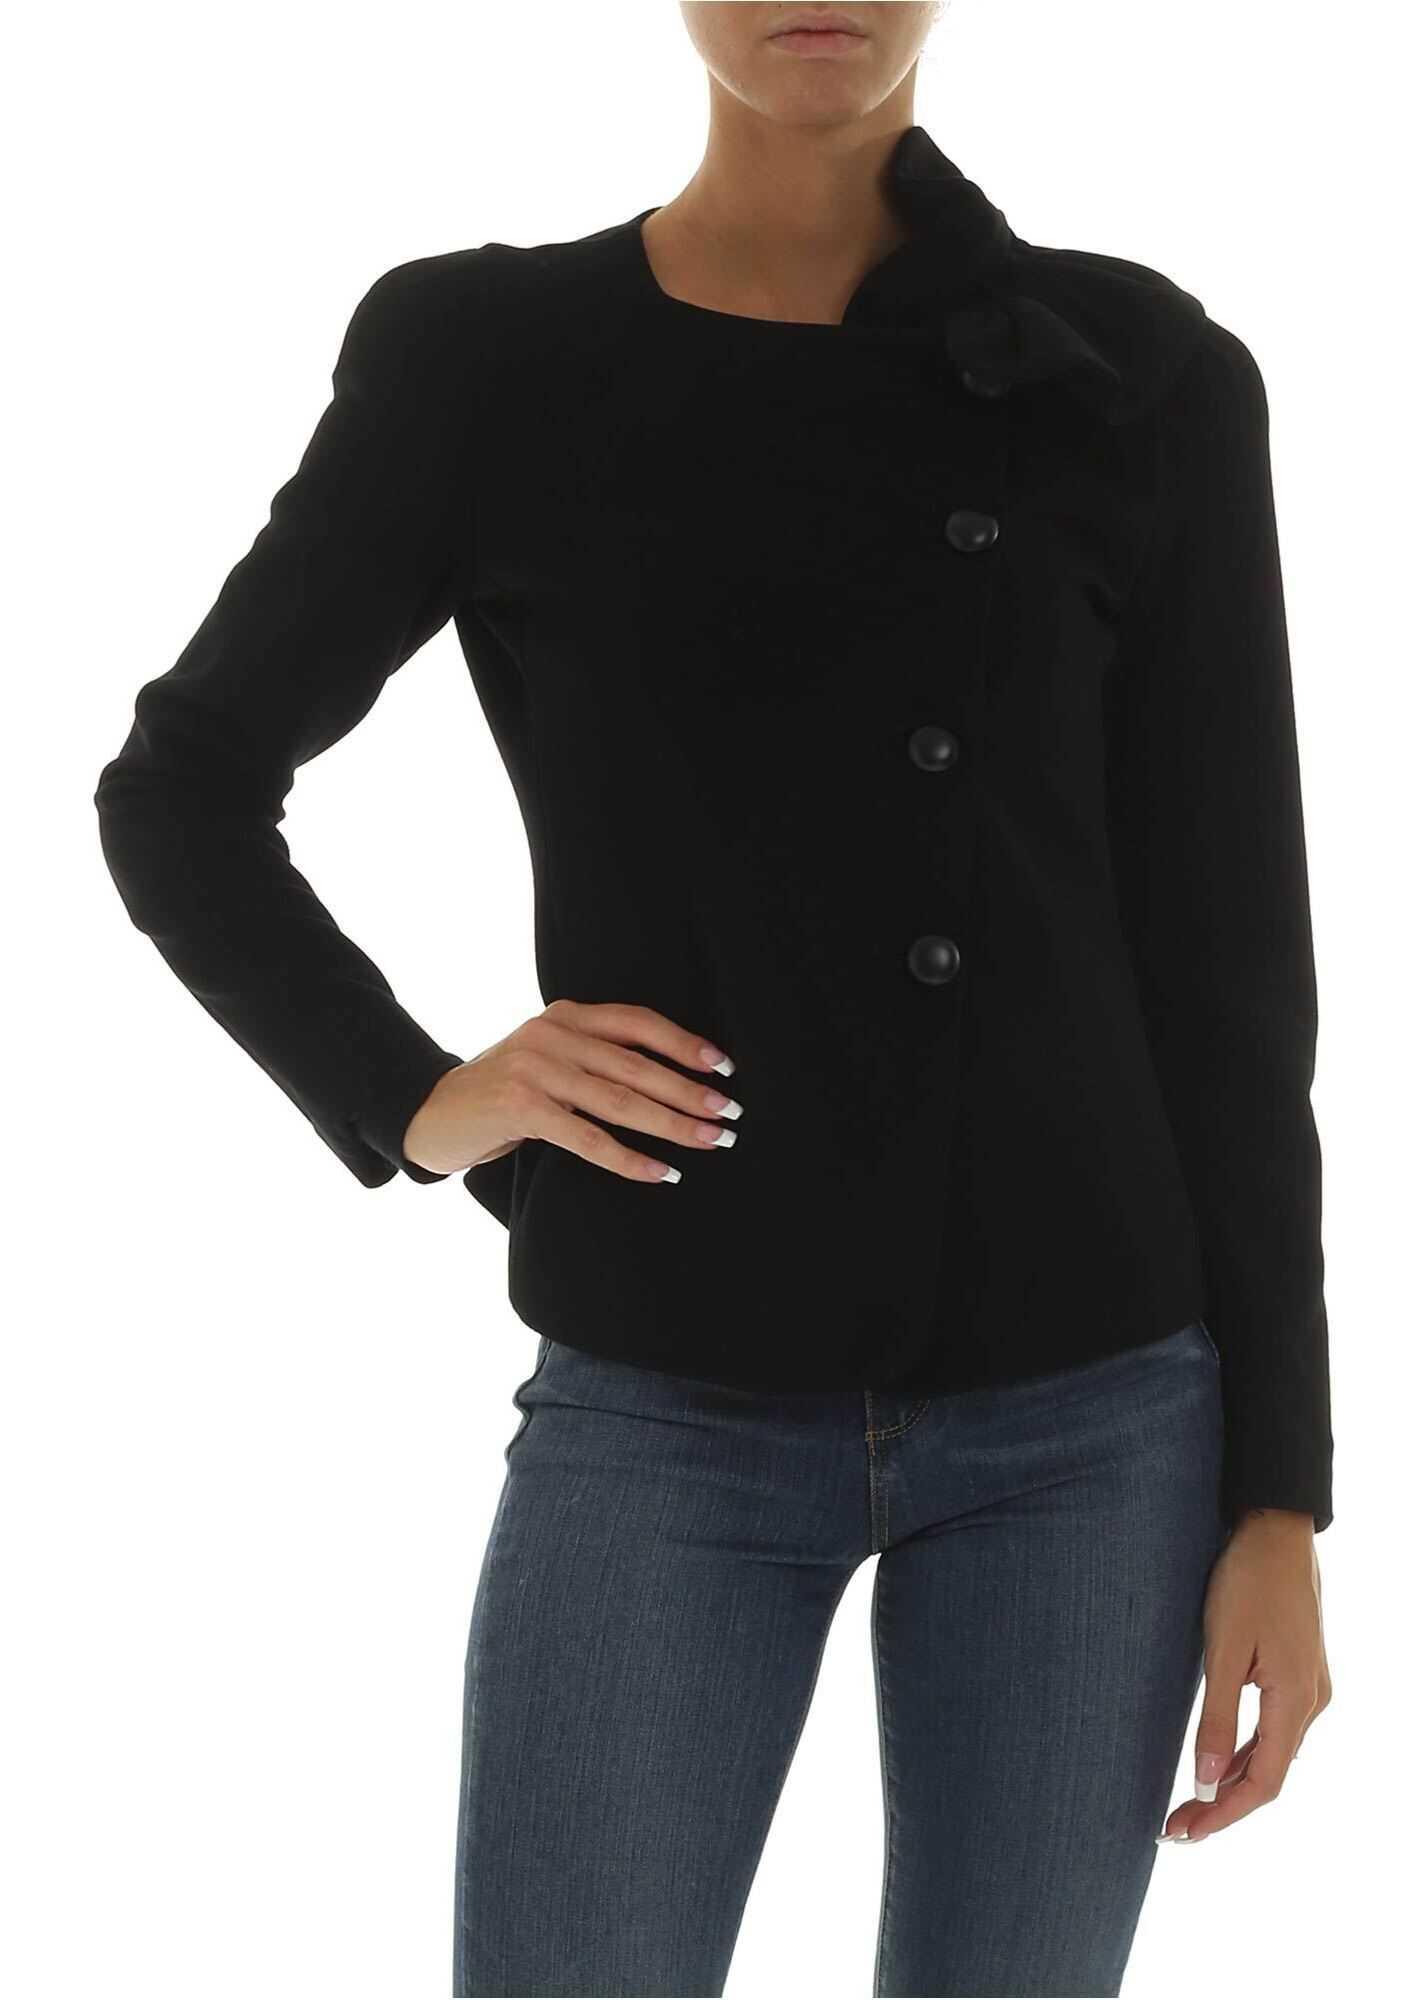 Black Jacket With Ruffles Detail thumbnail